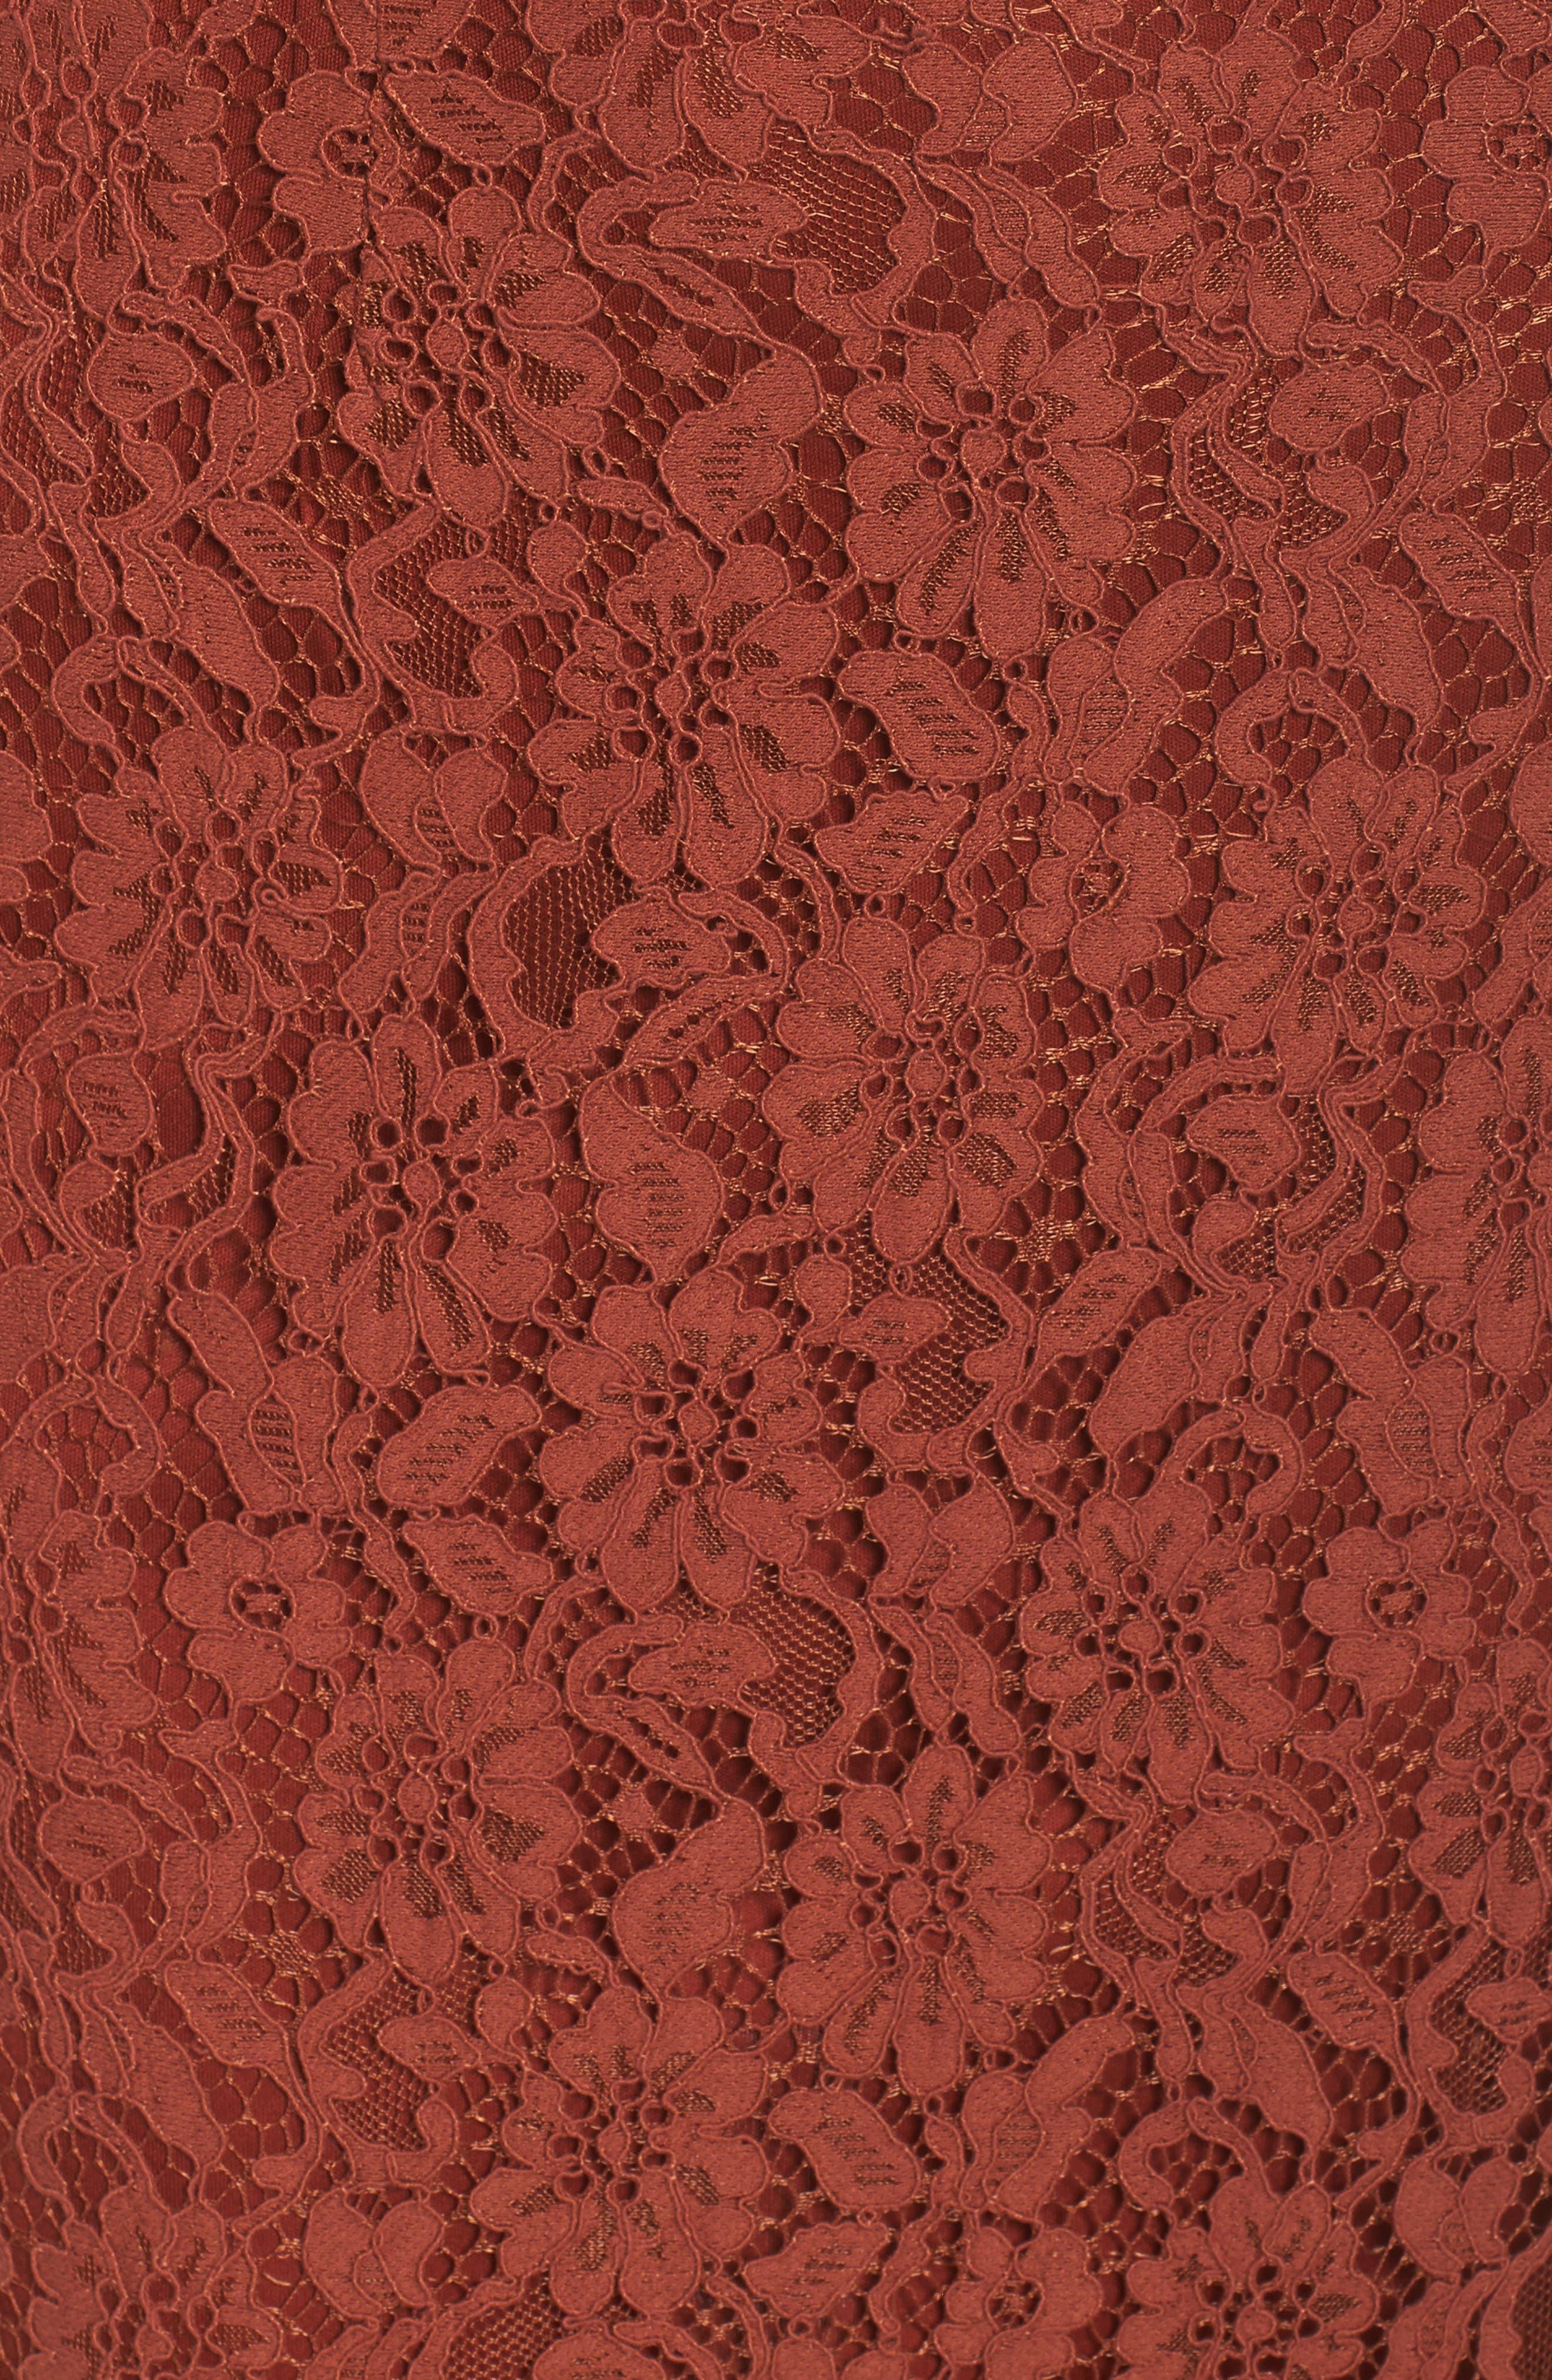 Lace Off the Shoulder Midi Dress,                             Alternate thumbnail 5, color,                             Cinnabar